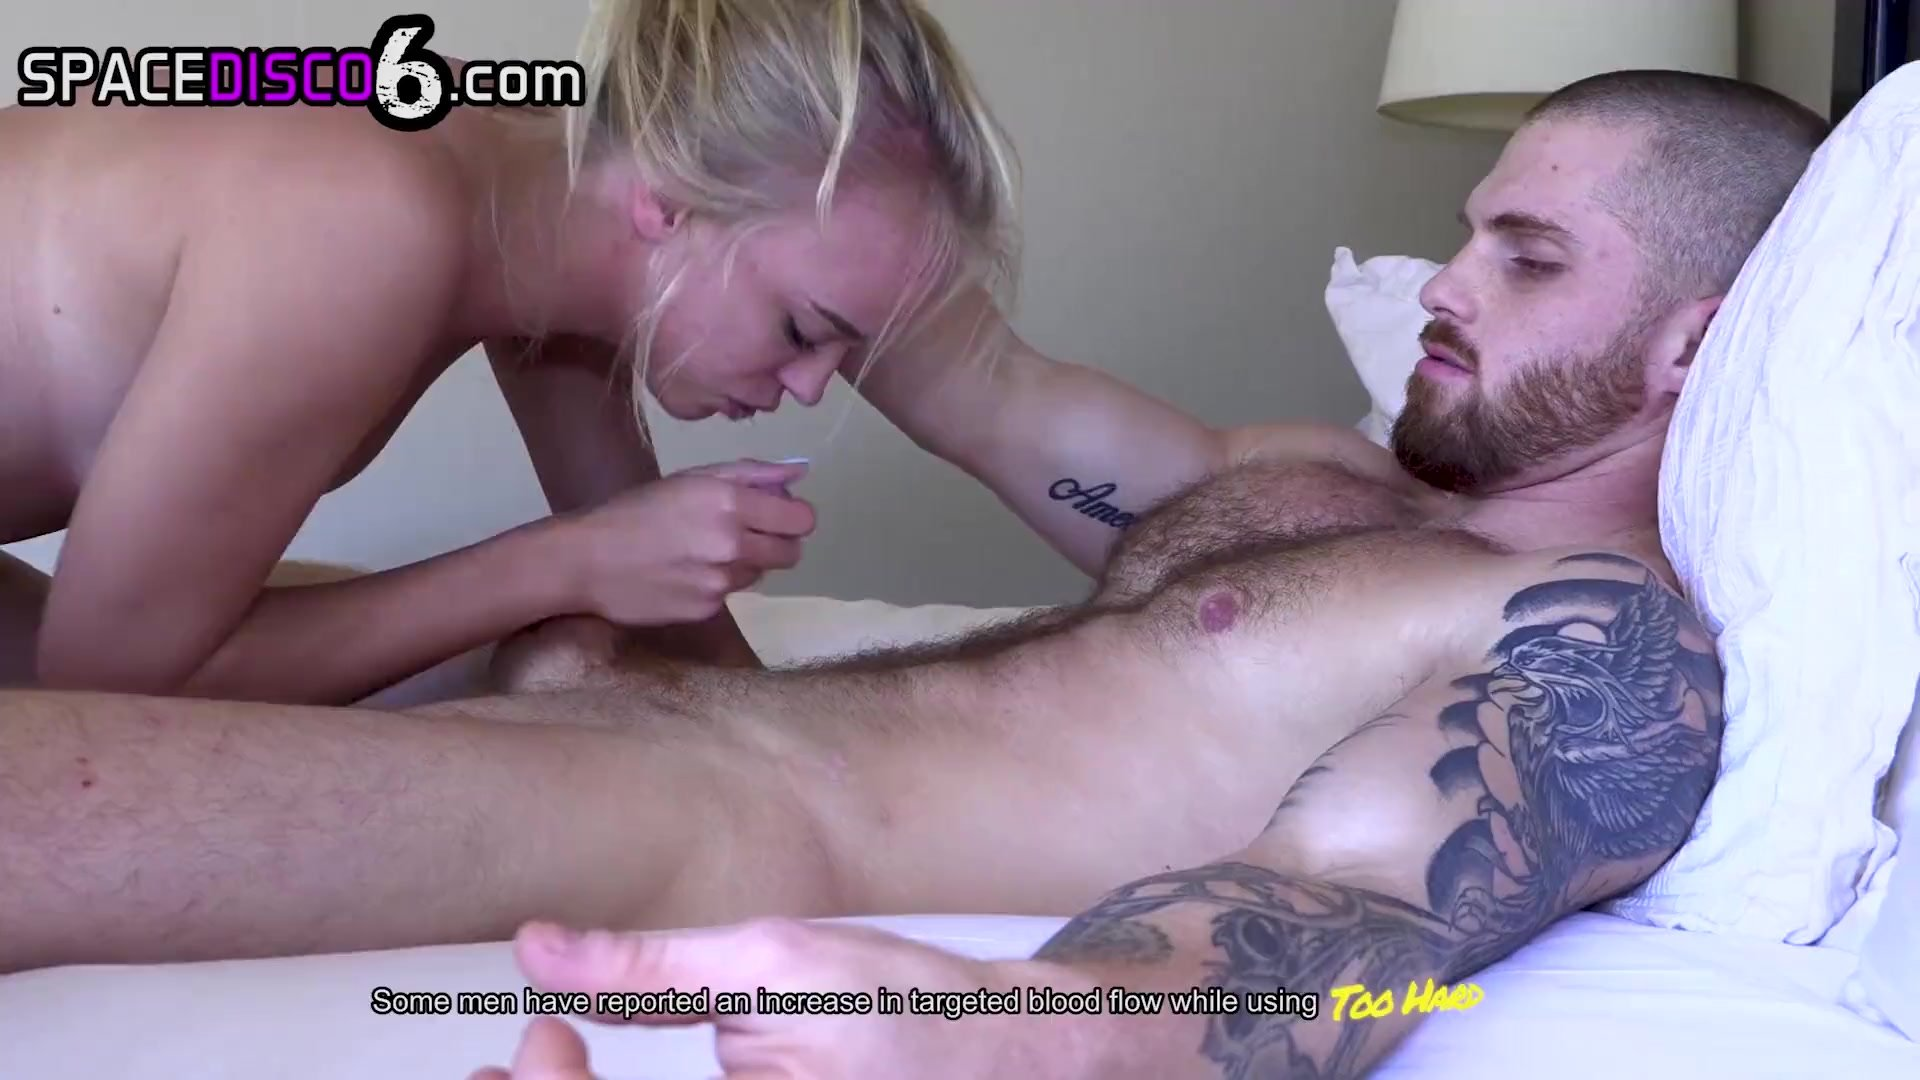 Tough Stud Fucks Tiny Spinner Babe ROUGH AS FUCK